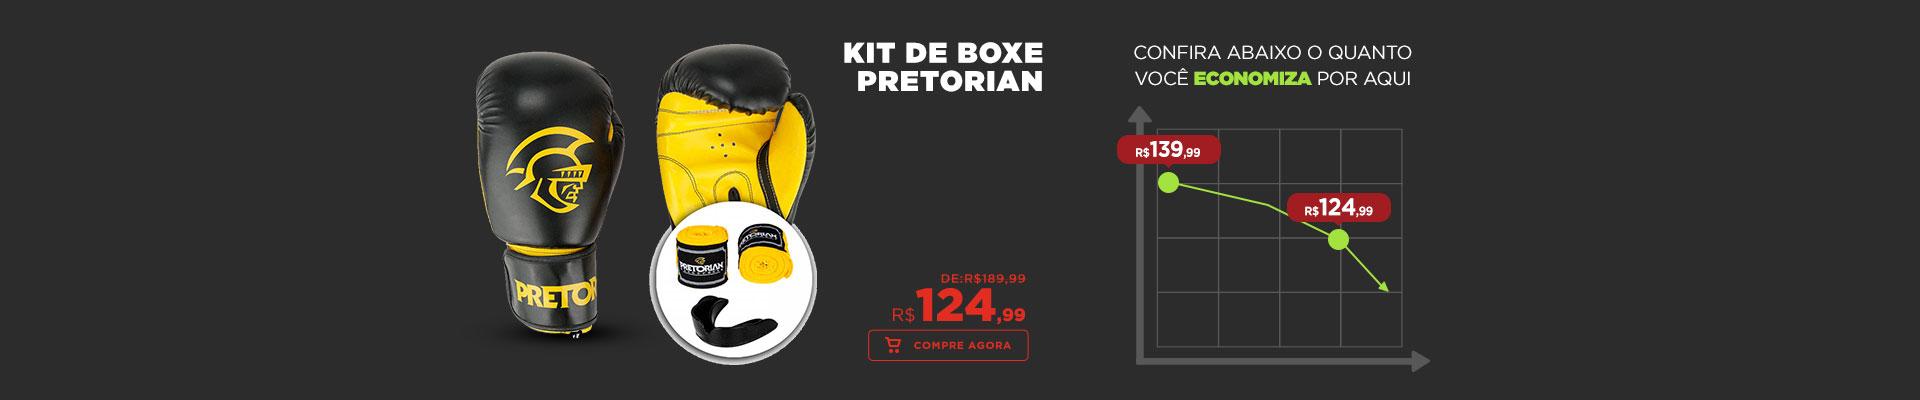 Kit de Boxe Pretorian